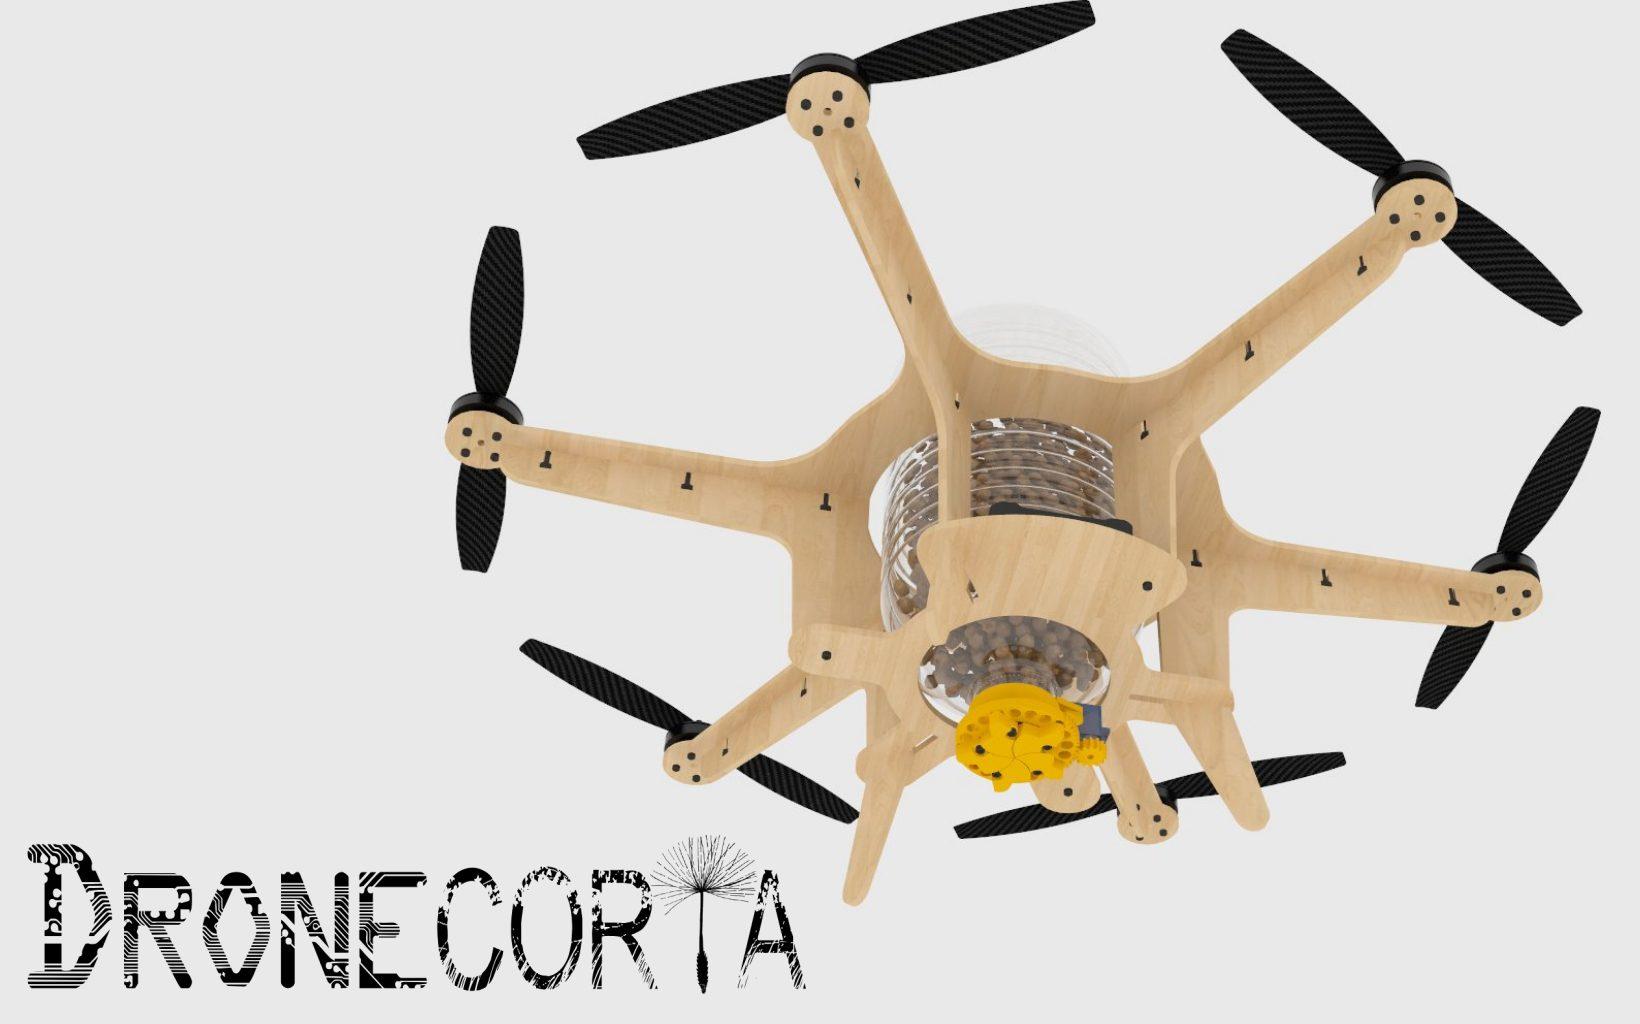 Dronecoria: Open Source Restoration